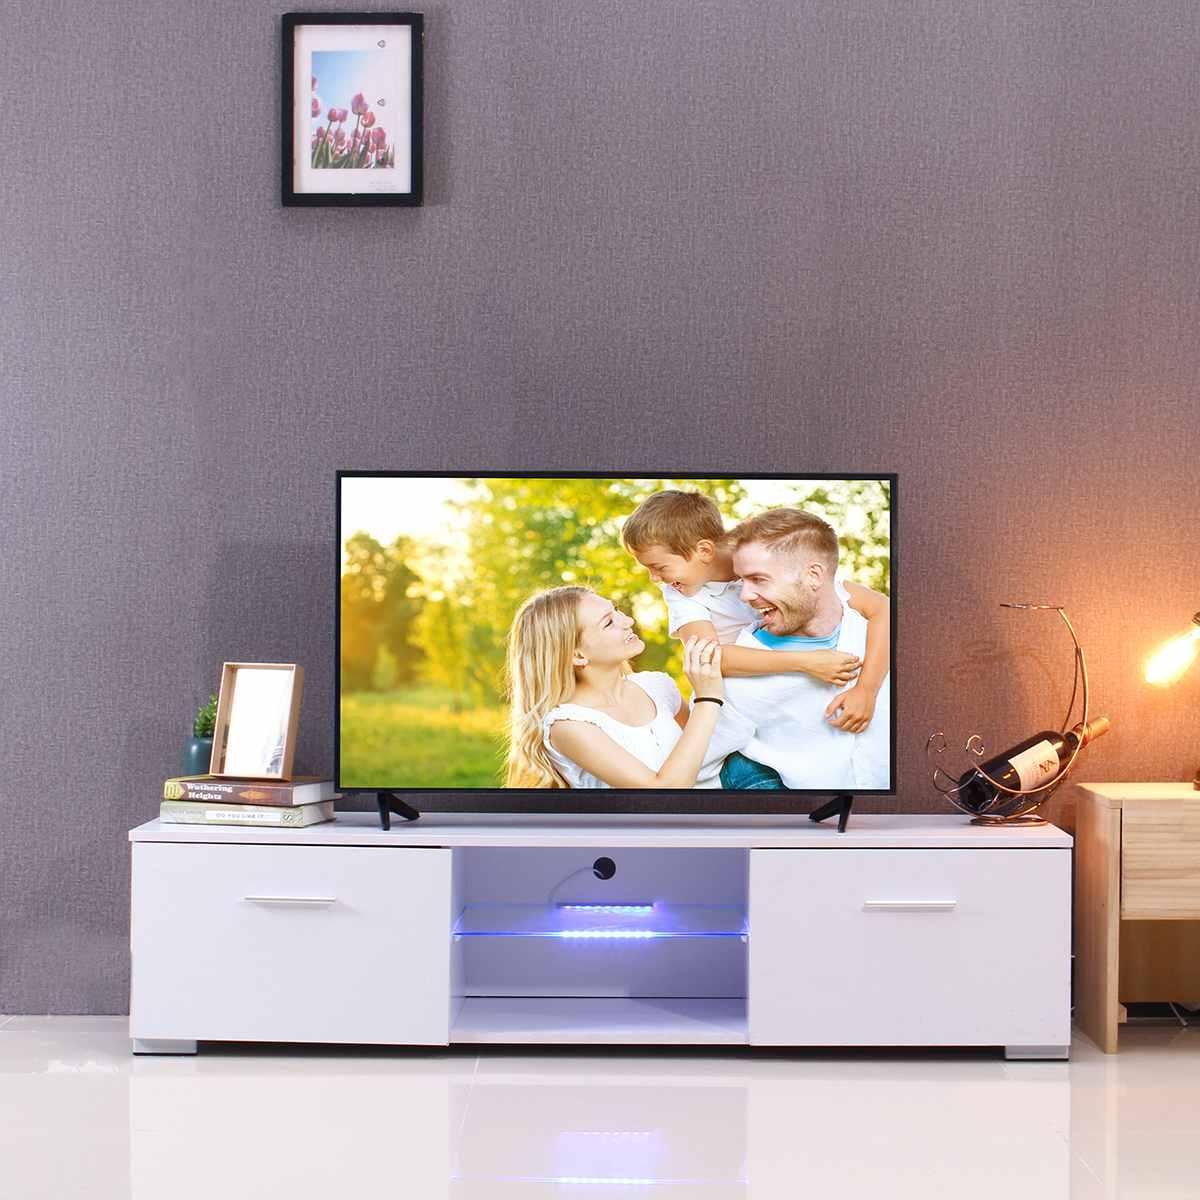 Tremendous 57 Inch White Black Wooden Tv Stands Portable Detachable Led Creativecarmelina Interior Chair Design Creativecarmelinacom